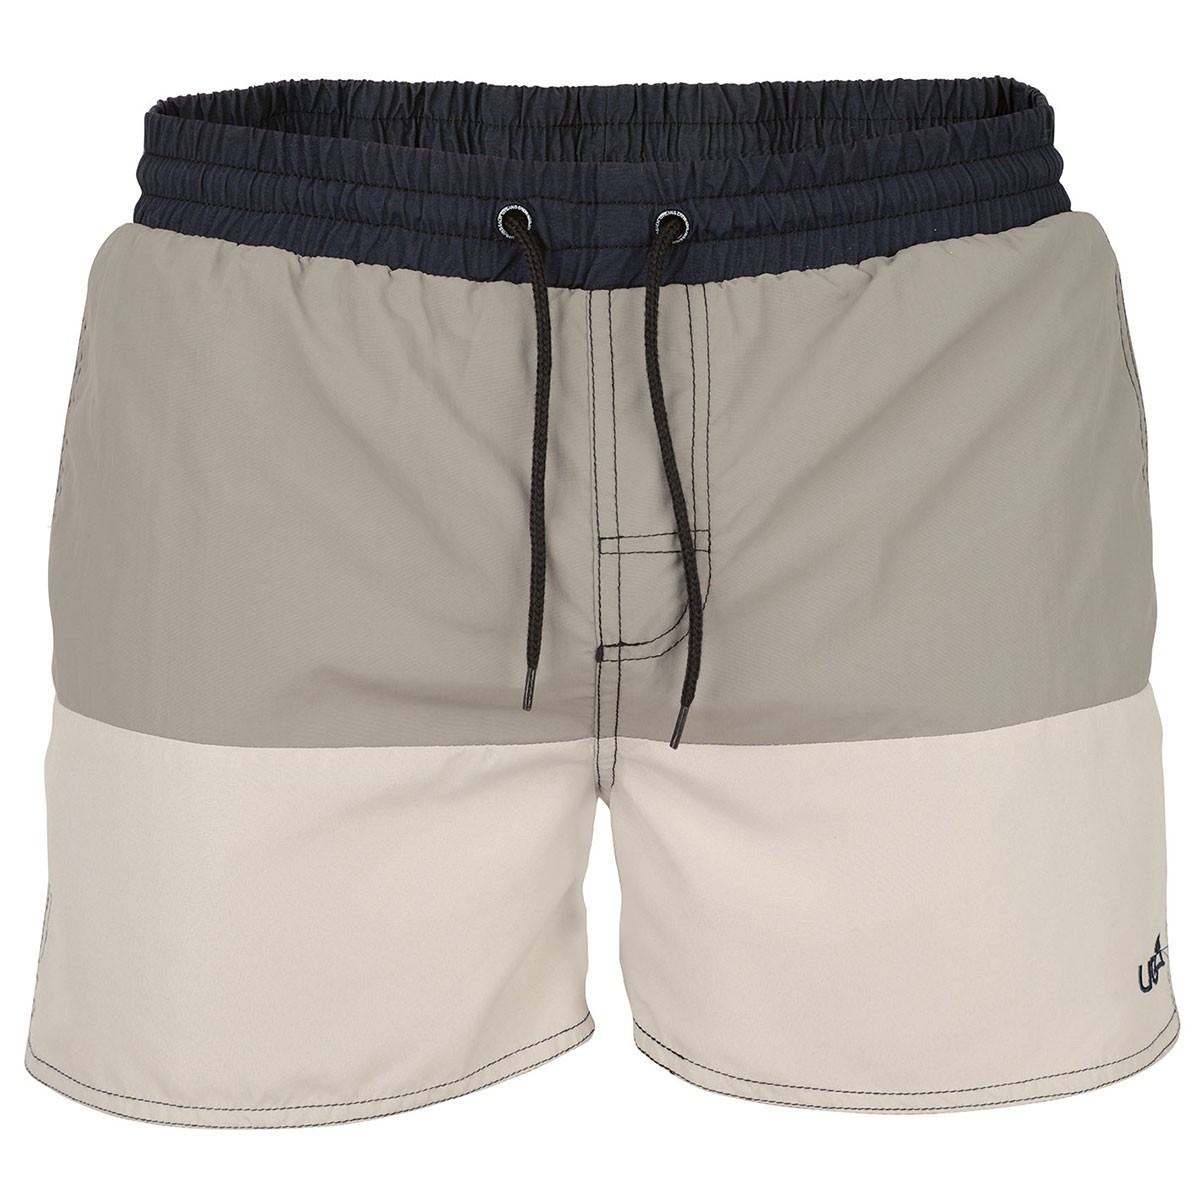 5acbd2ba42 Mens Chopes Swim Shorts - Black - Boardshorts & Swim Shorts ...